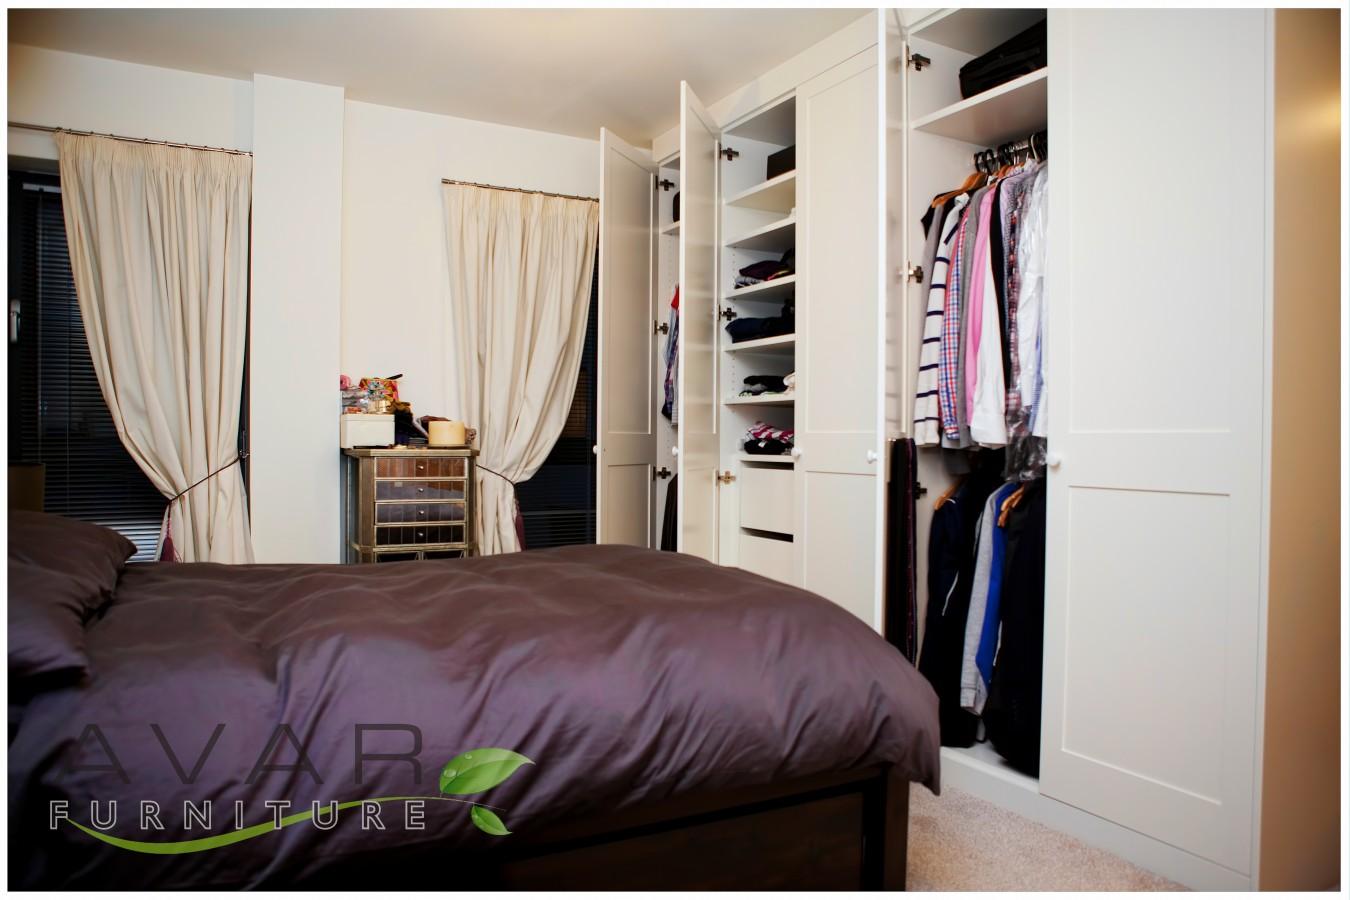 Fitted wardrobe ideas gallery 3 north london uk avar furniture - Fitted Wardrobe Ideas Gallery 12 North London Uk